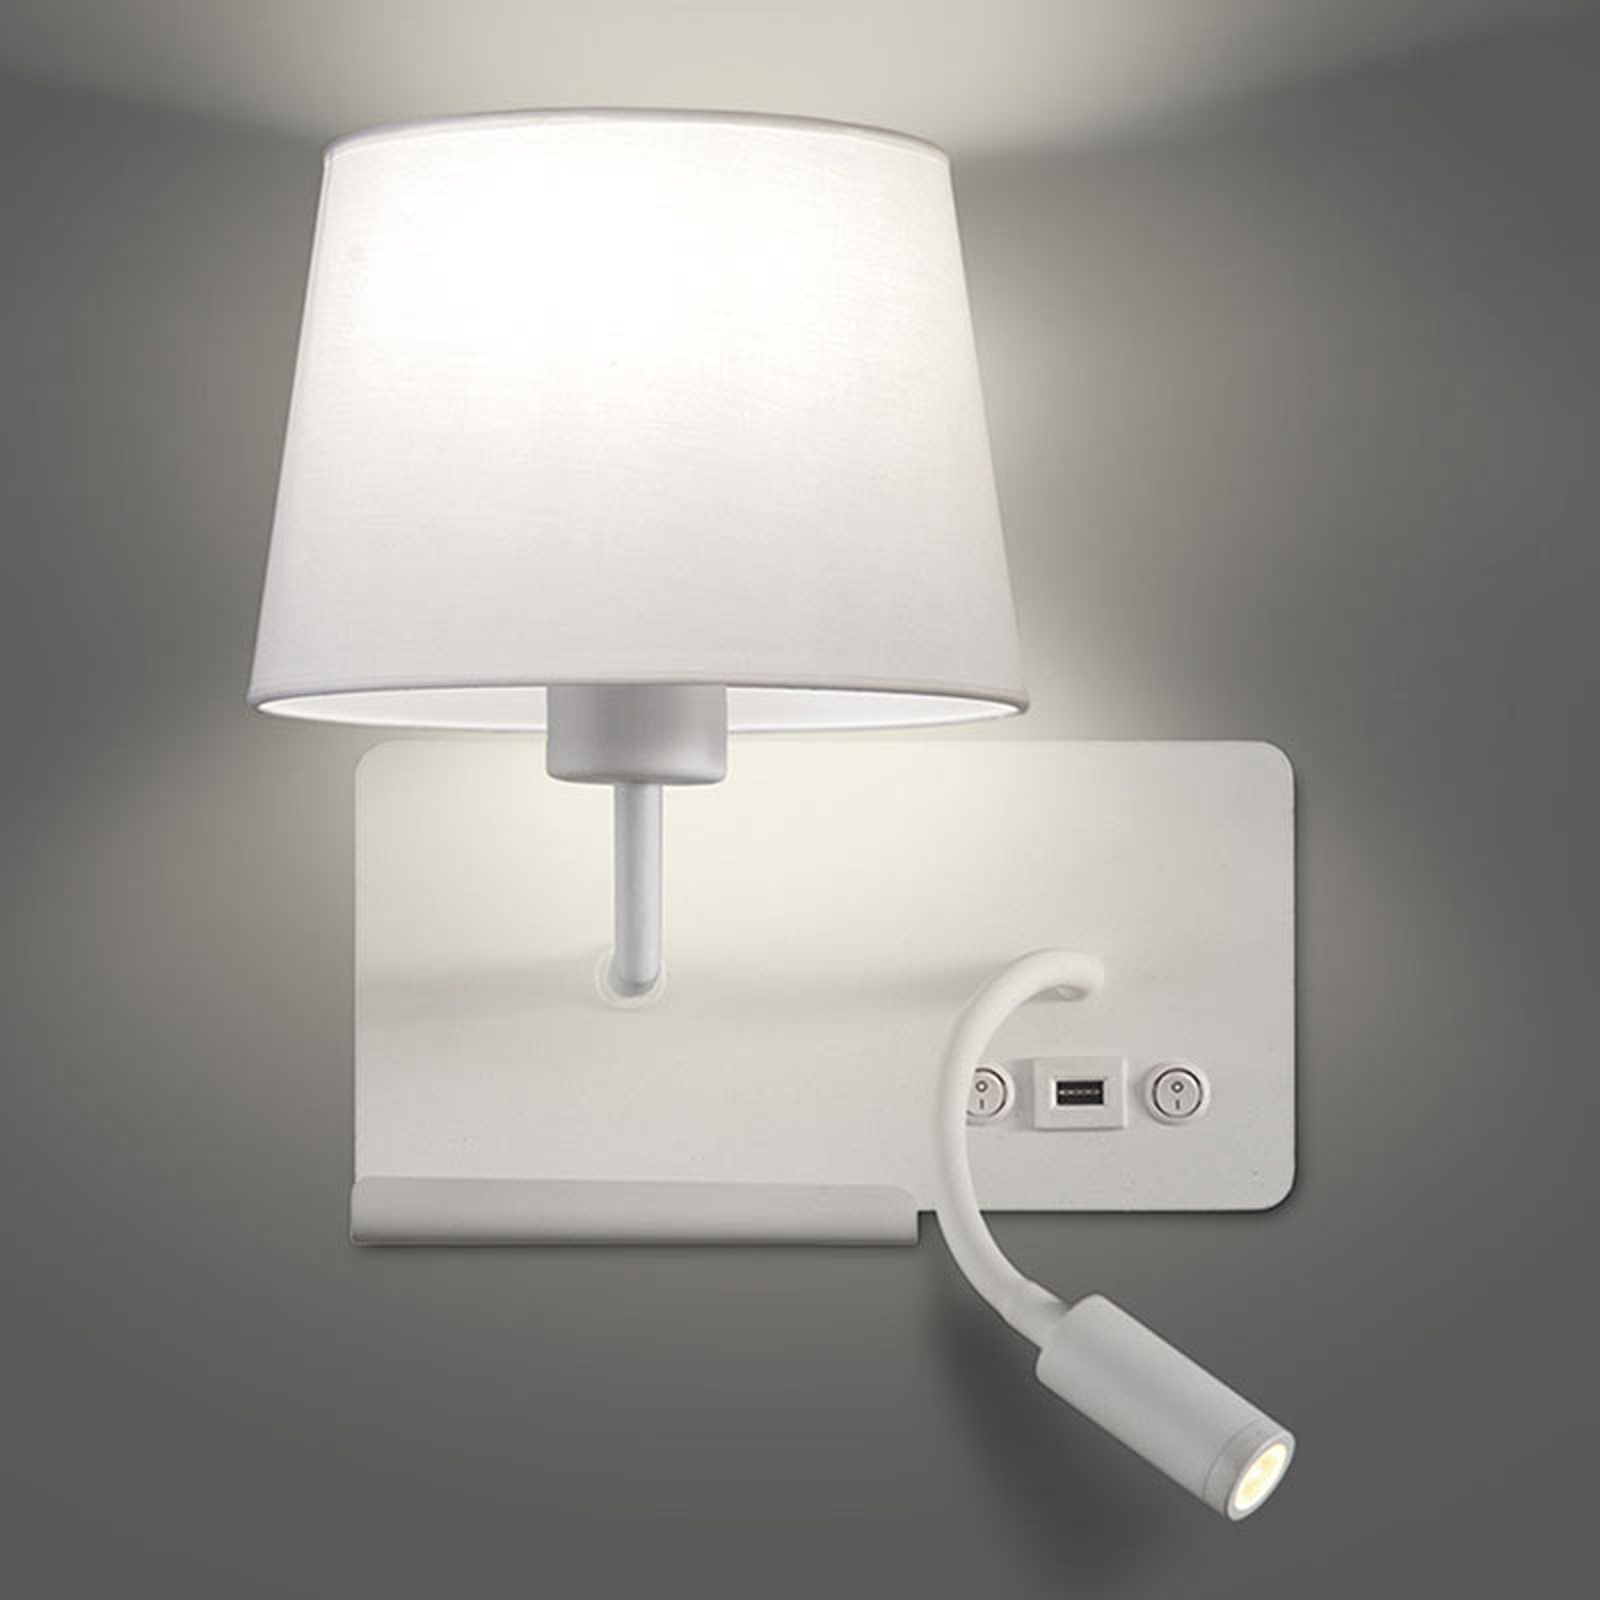 Wandlamp Hold links, incl. leesarm en USB-poort